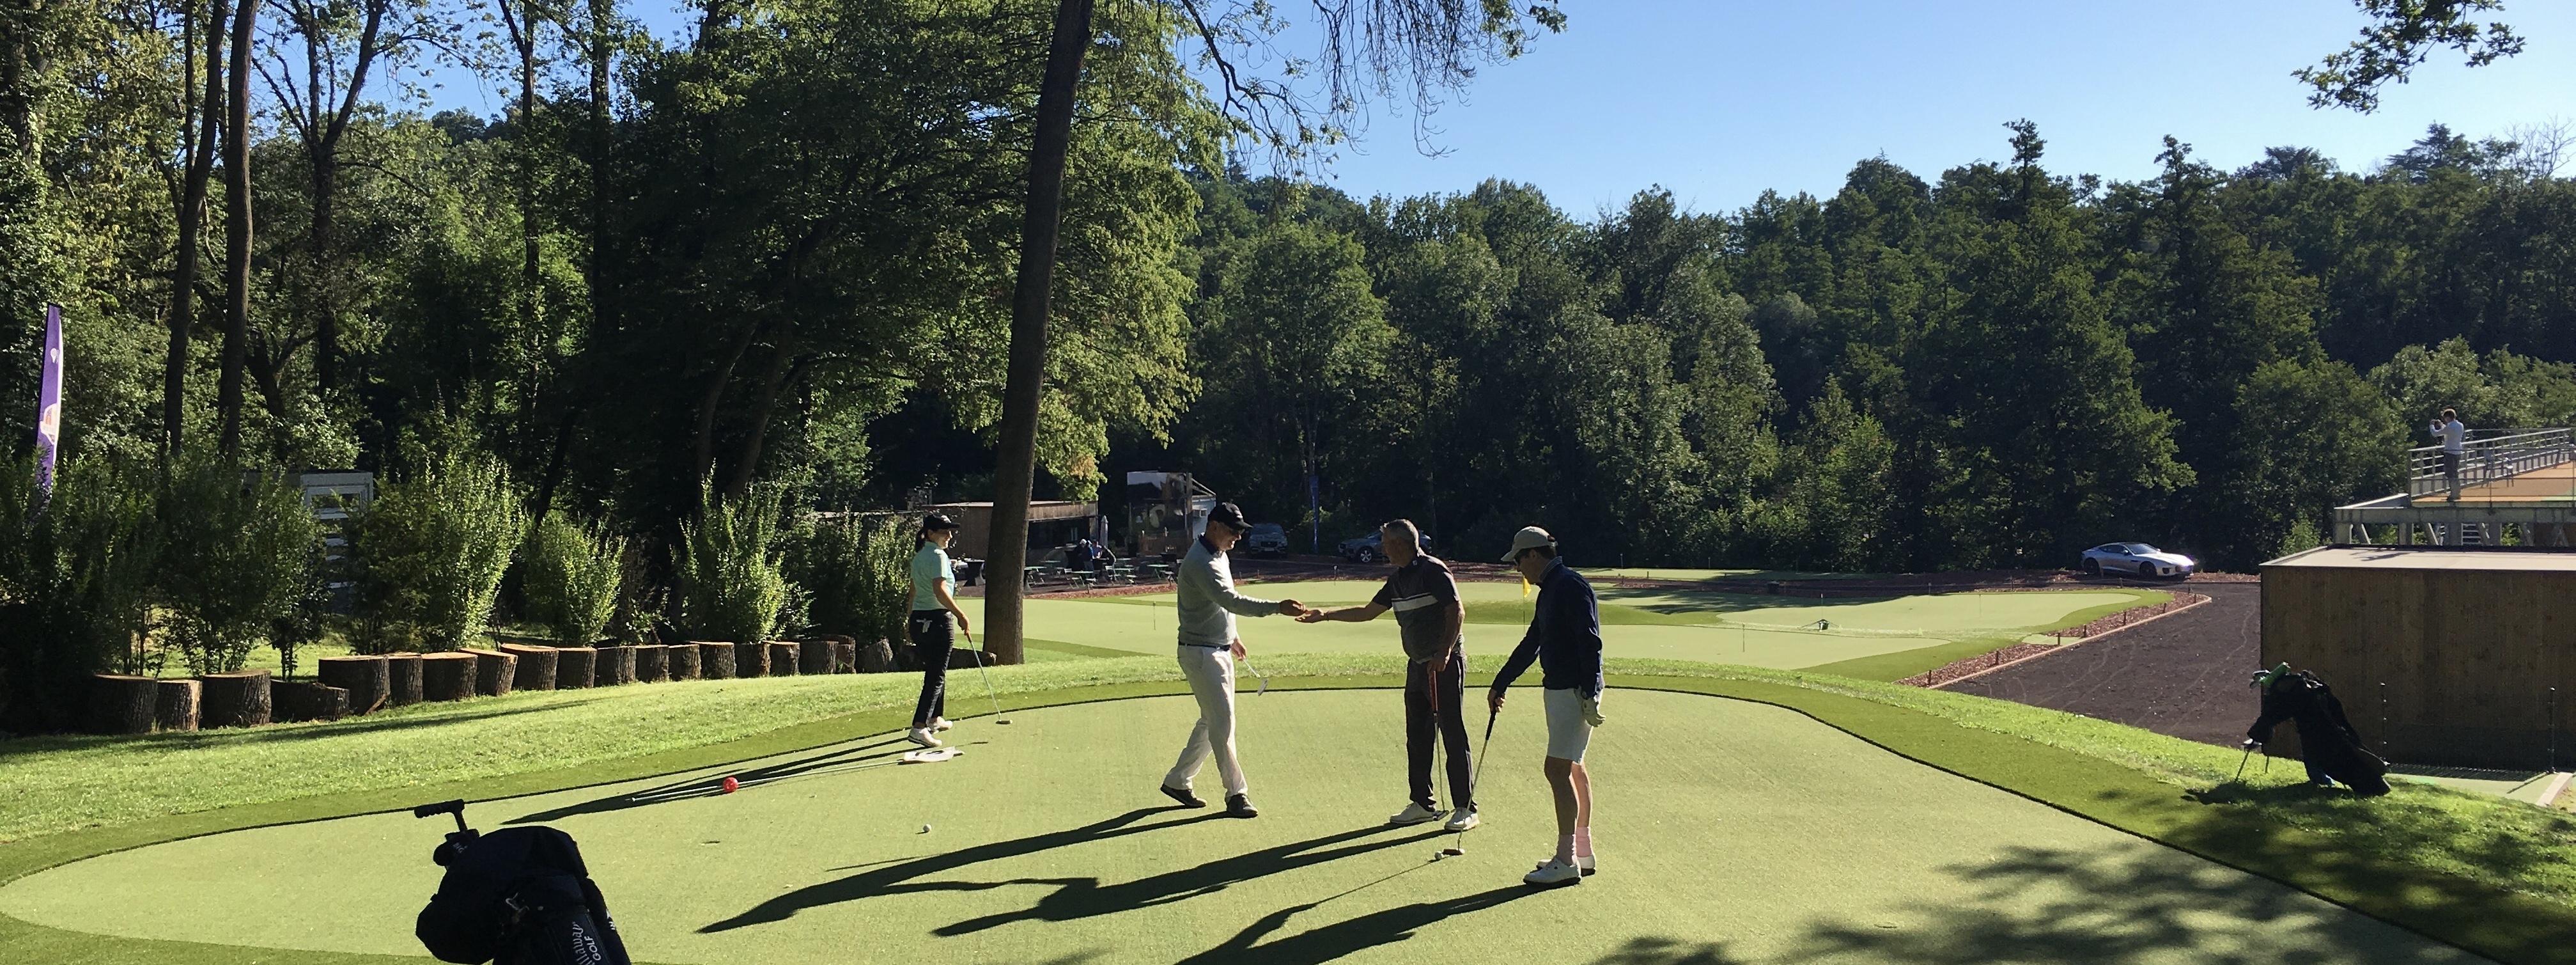 Compétition de golf GIVE & TAKE